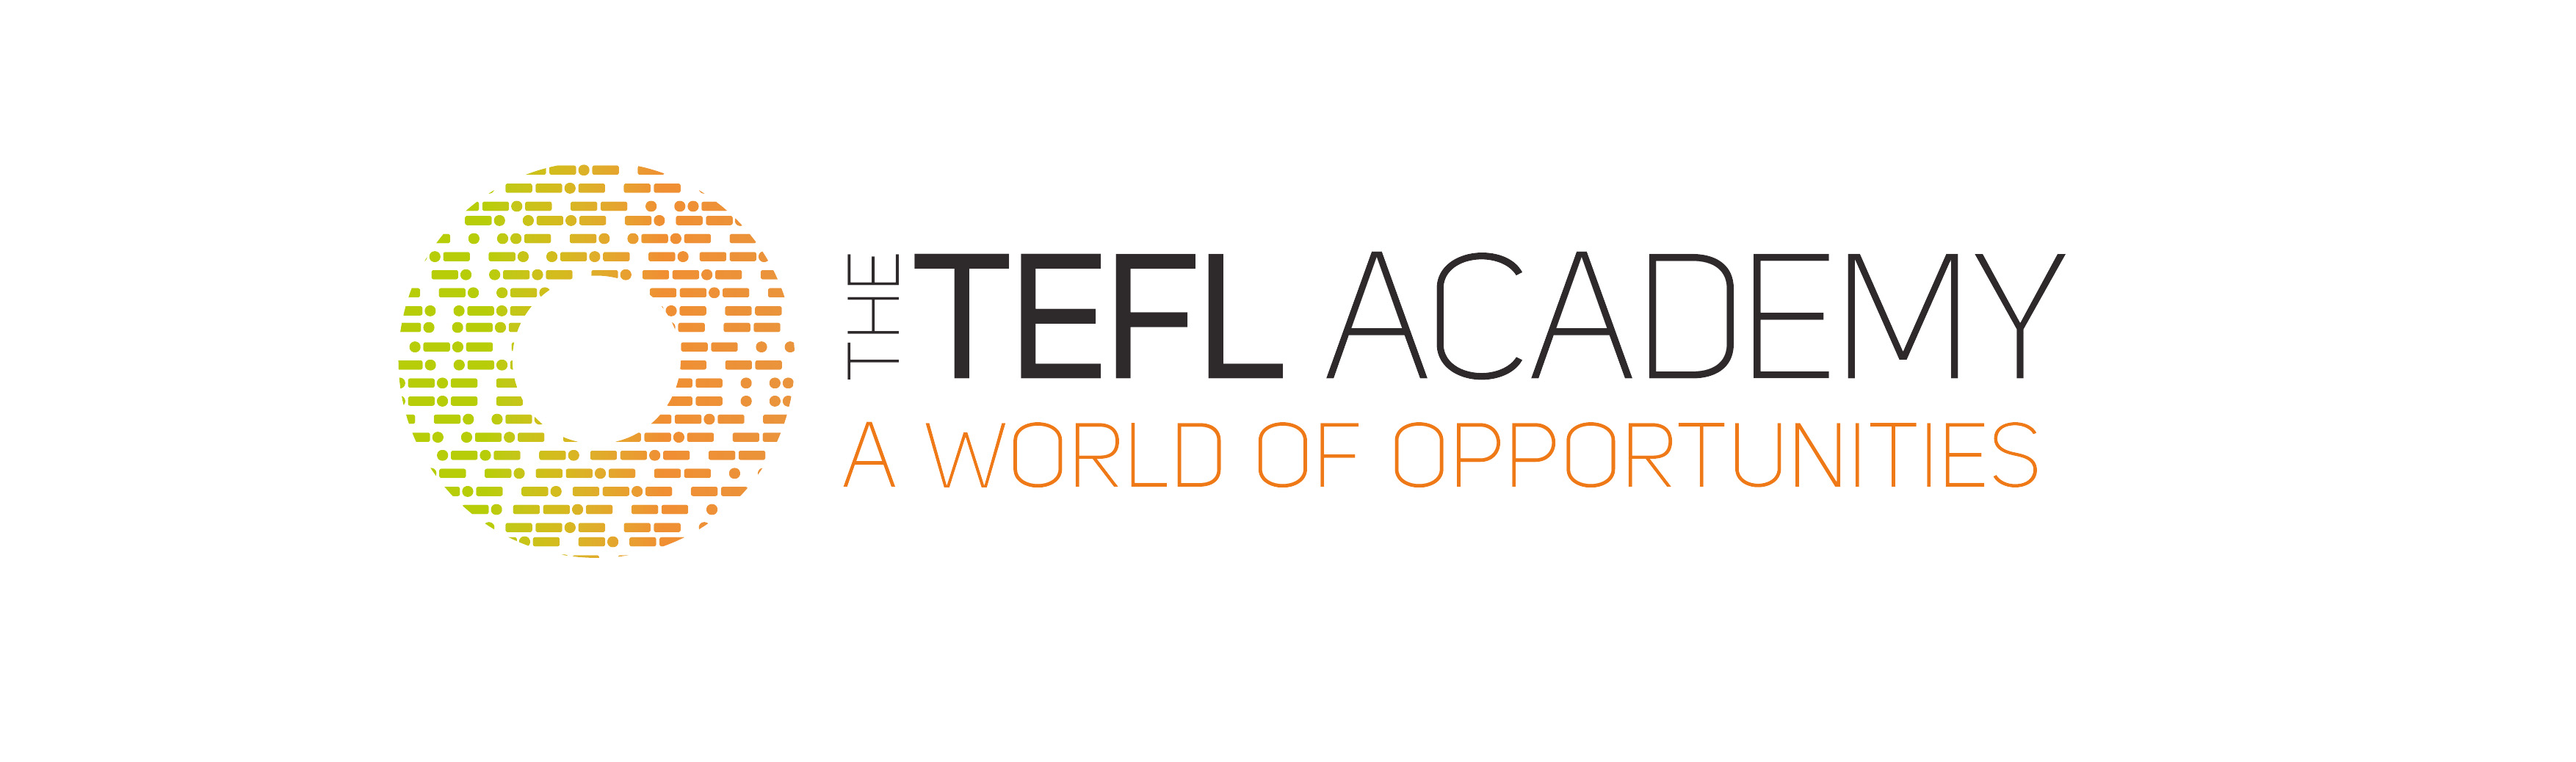 TEFL Academy